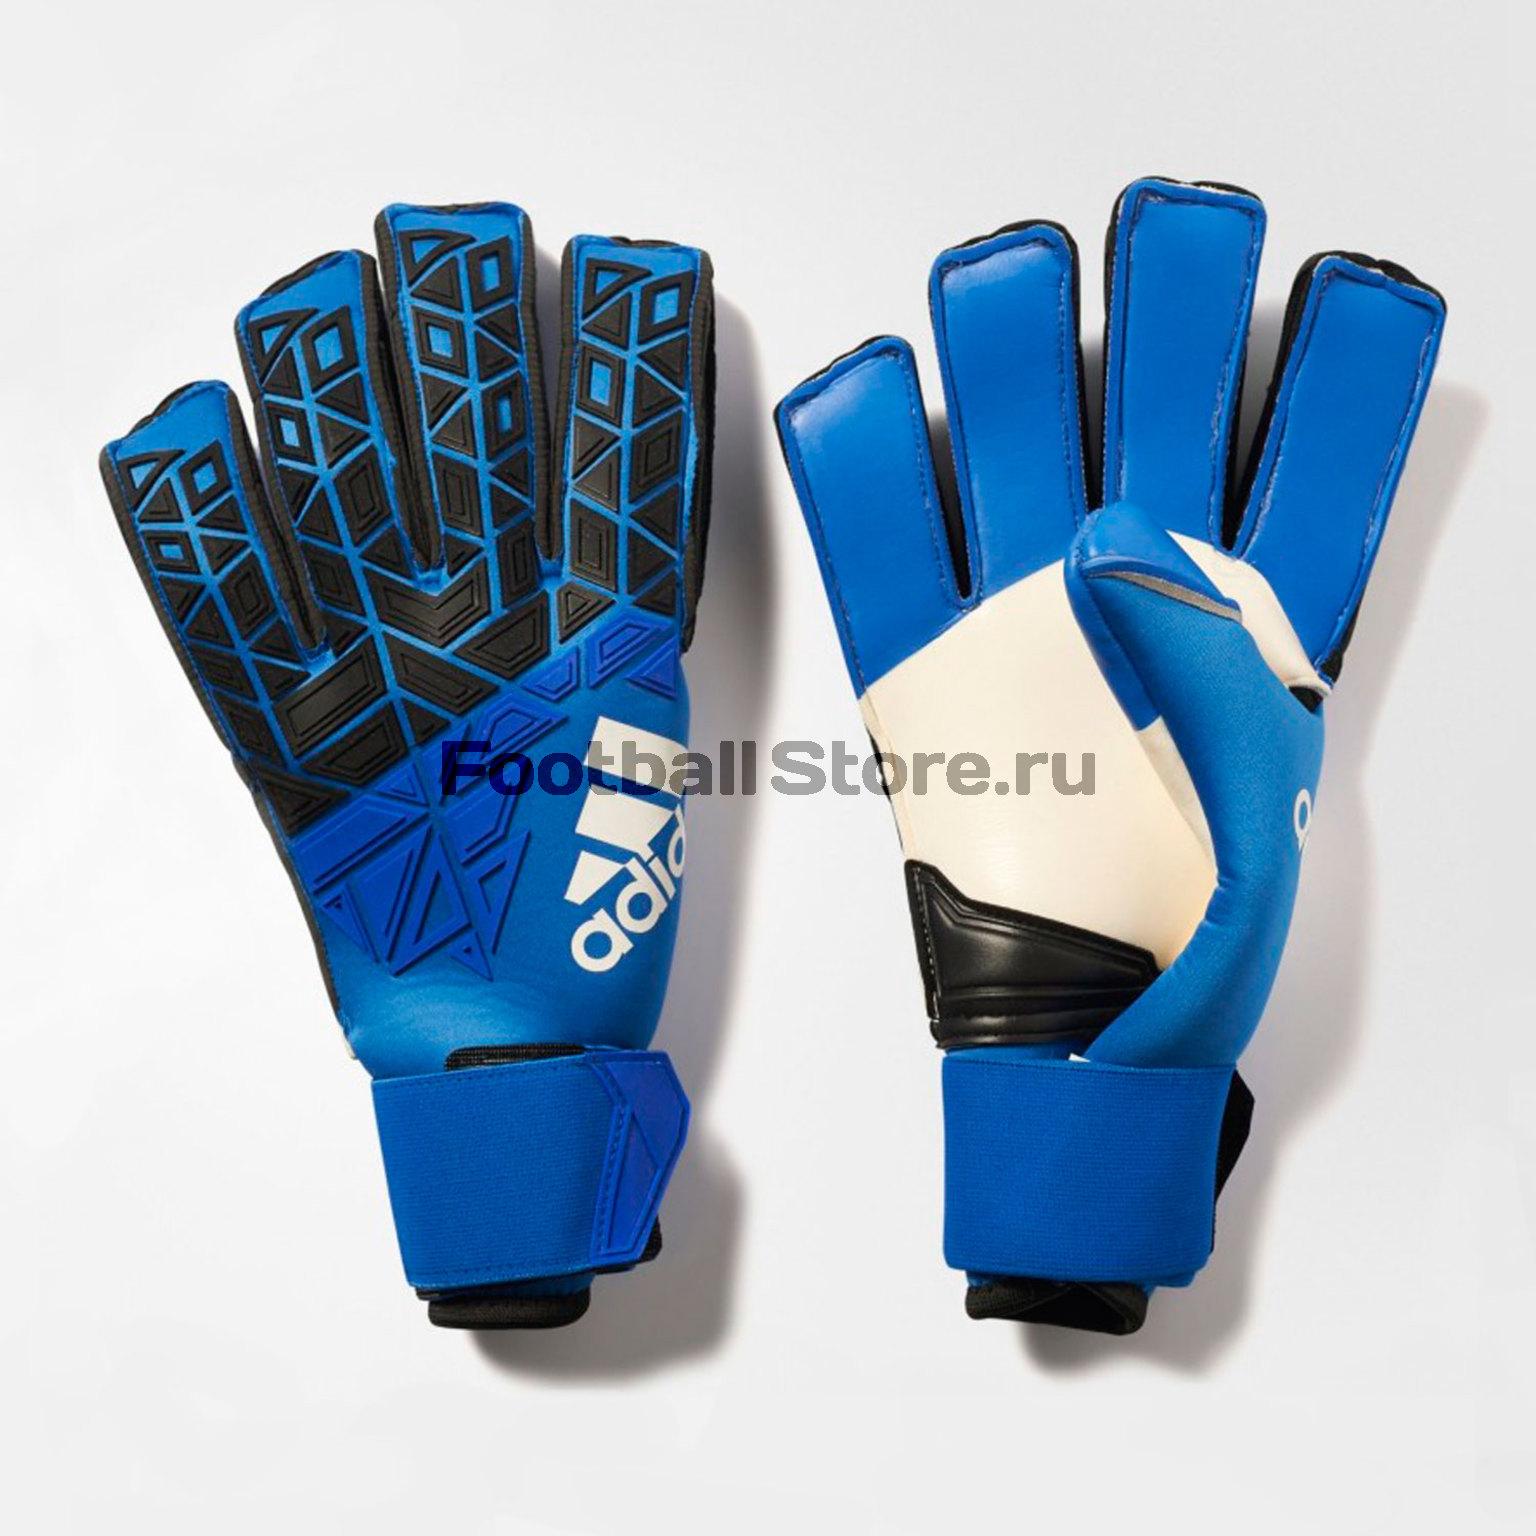 Перчатки вратарские Adidas Ace FS Promo AZ3707 adidas adidas ace 16 1 ct